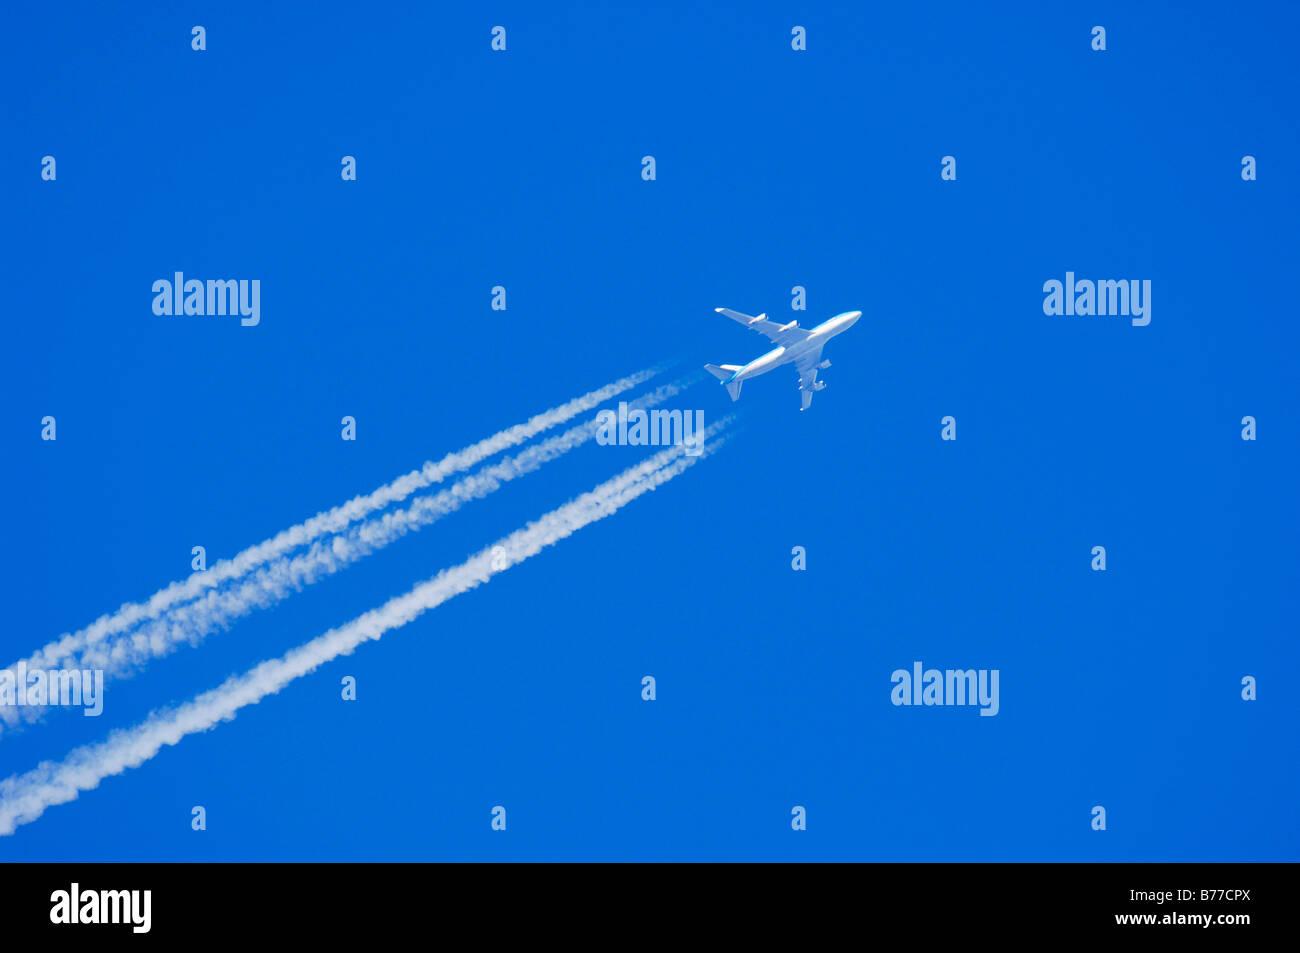 Flugzeug mit Kondensation trail Stockbild